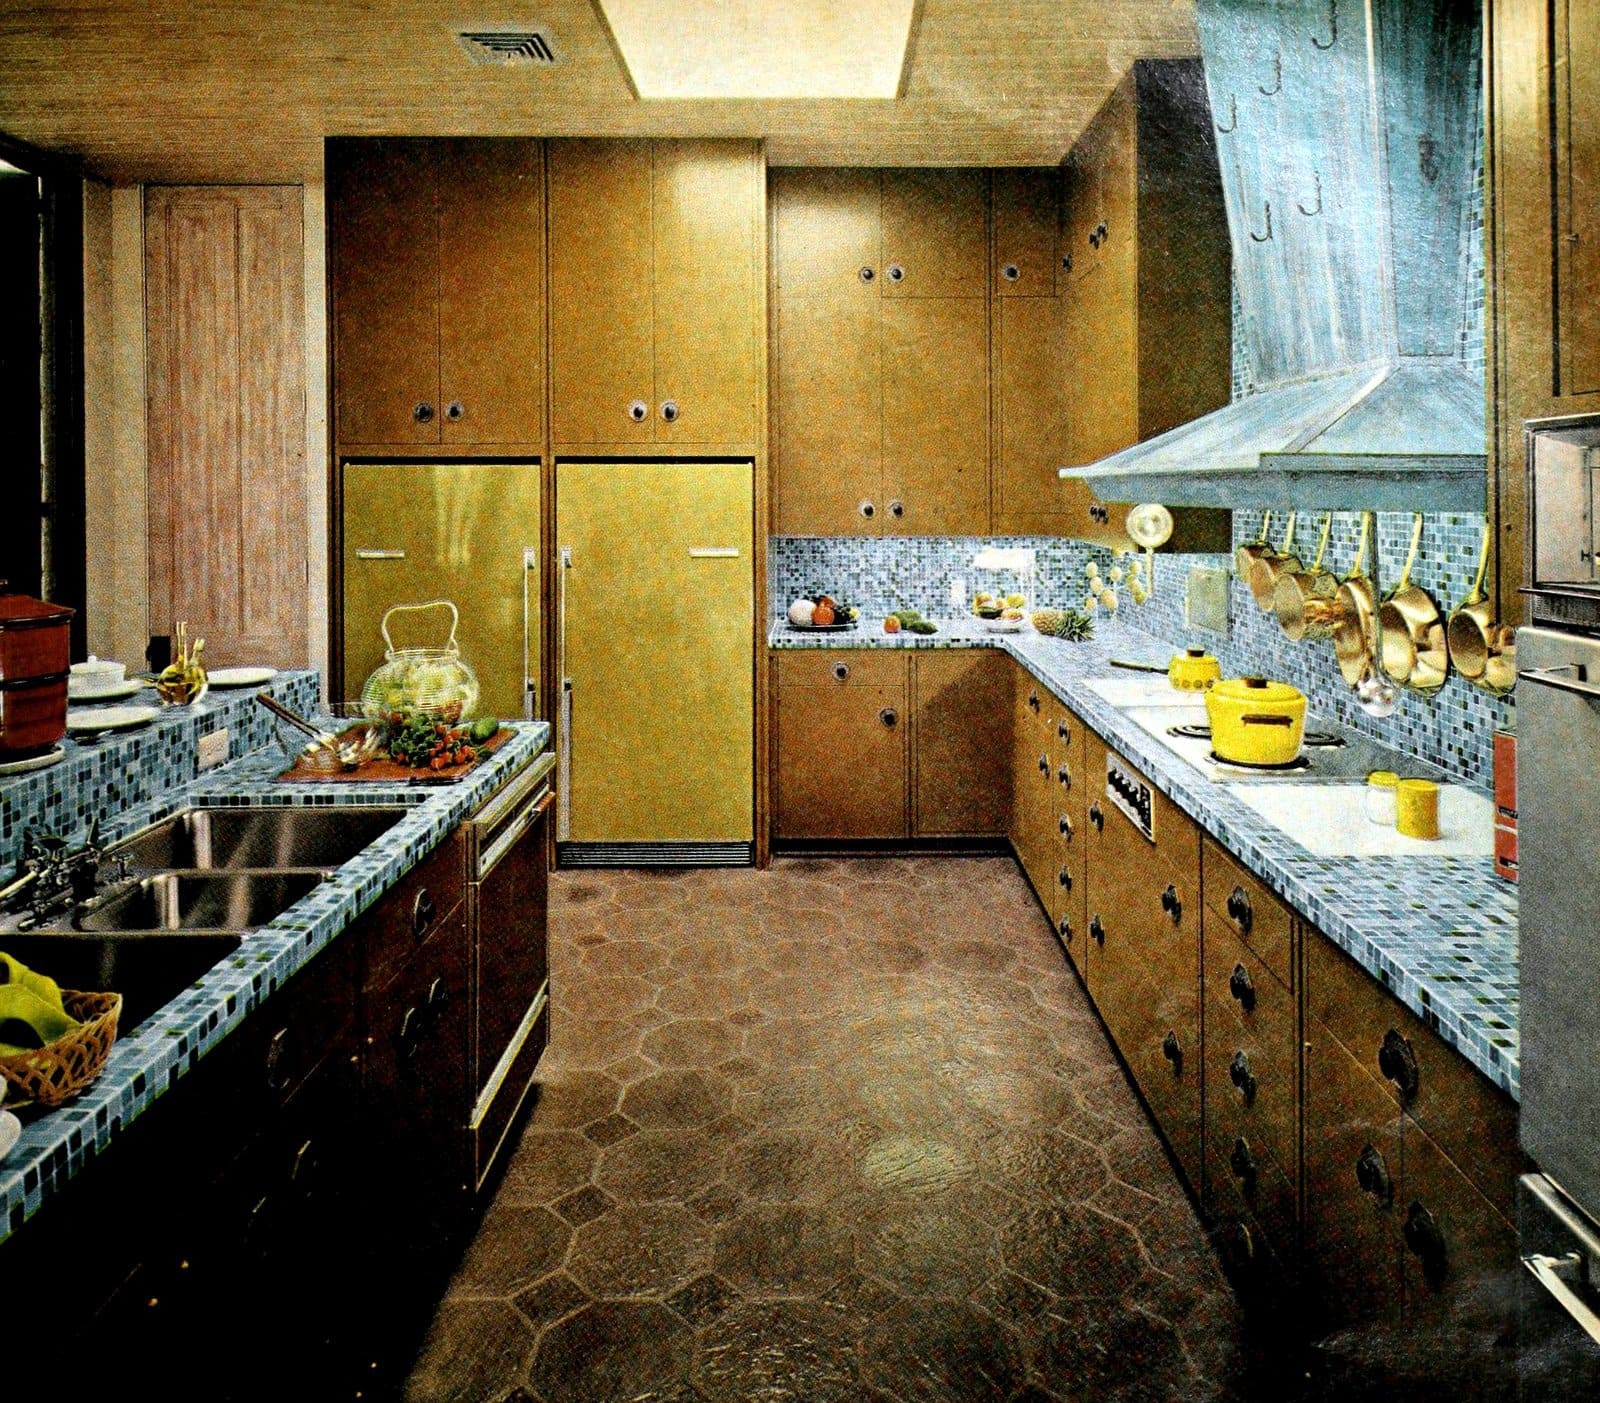 Retro sixties blue mosaic counterops and backsplash (1967)